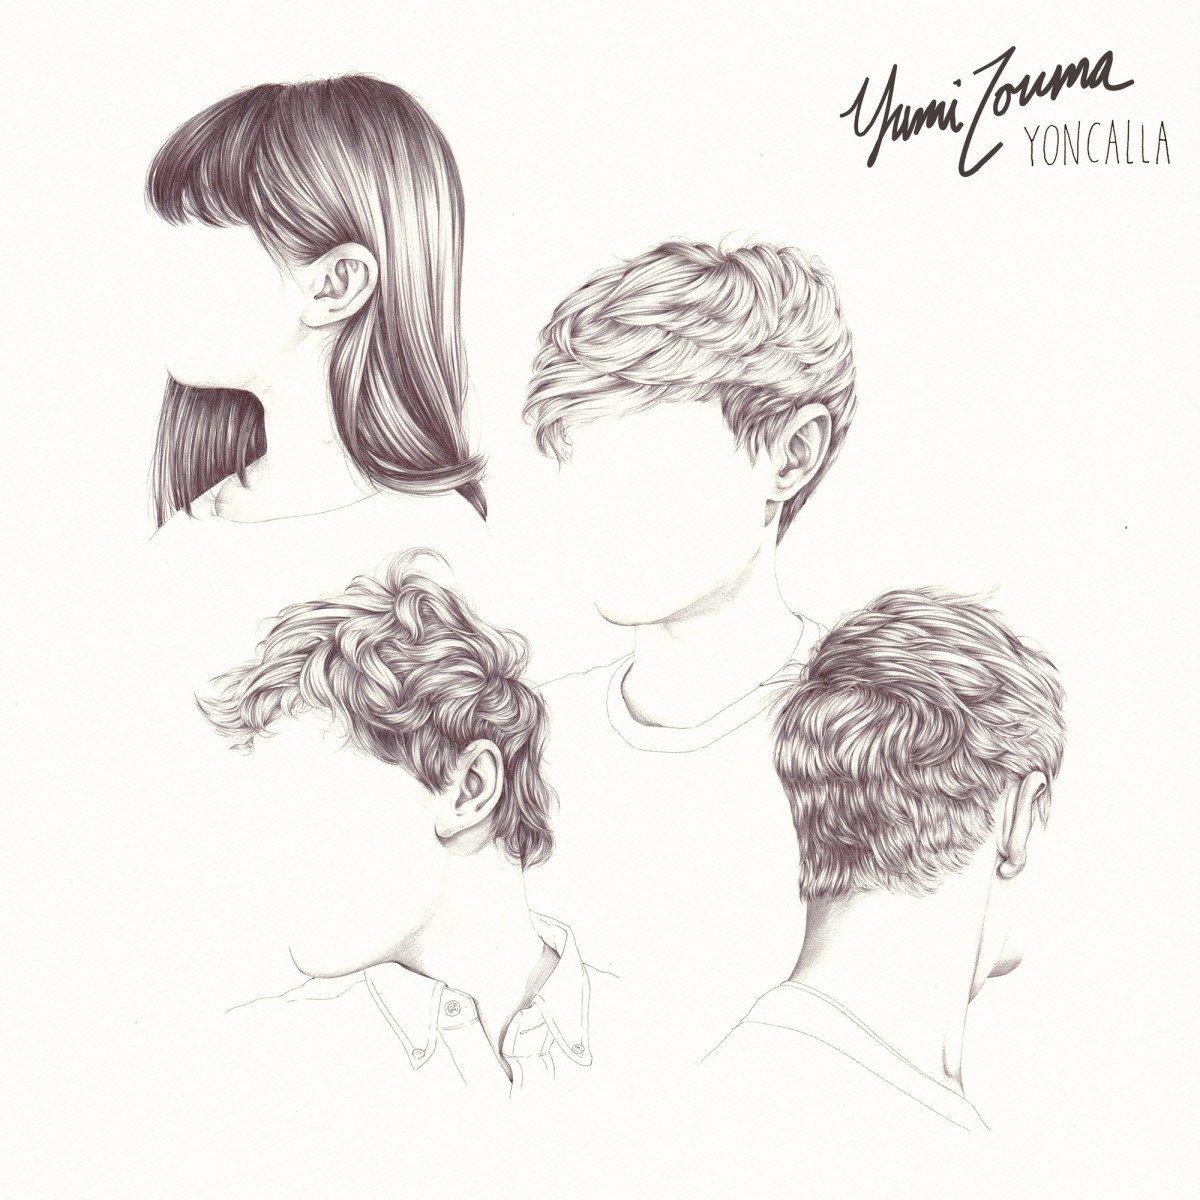 Yumi Zouma – Yoncalla (Cascine)